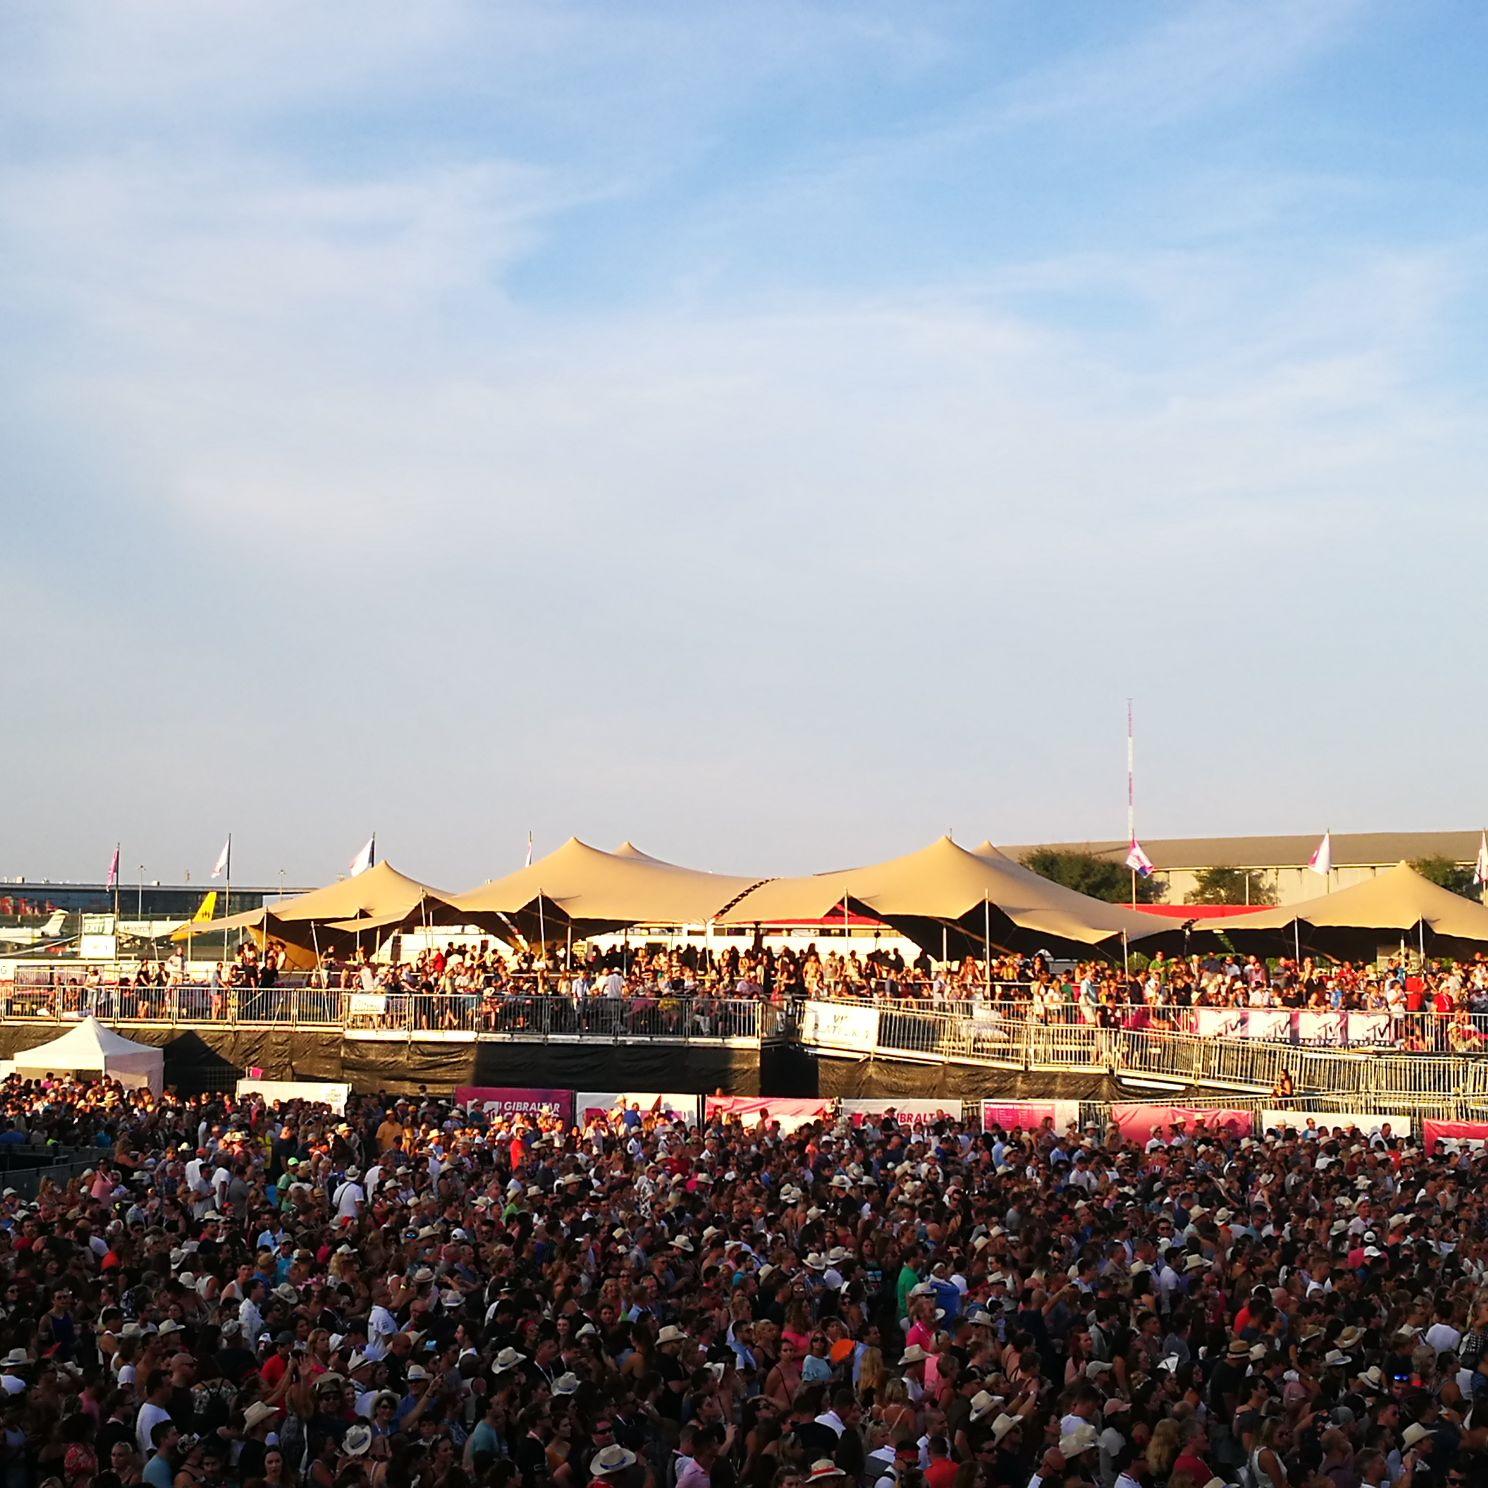 Festivales